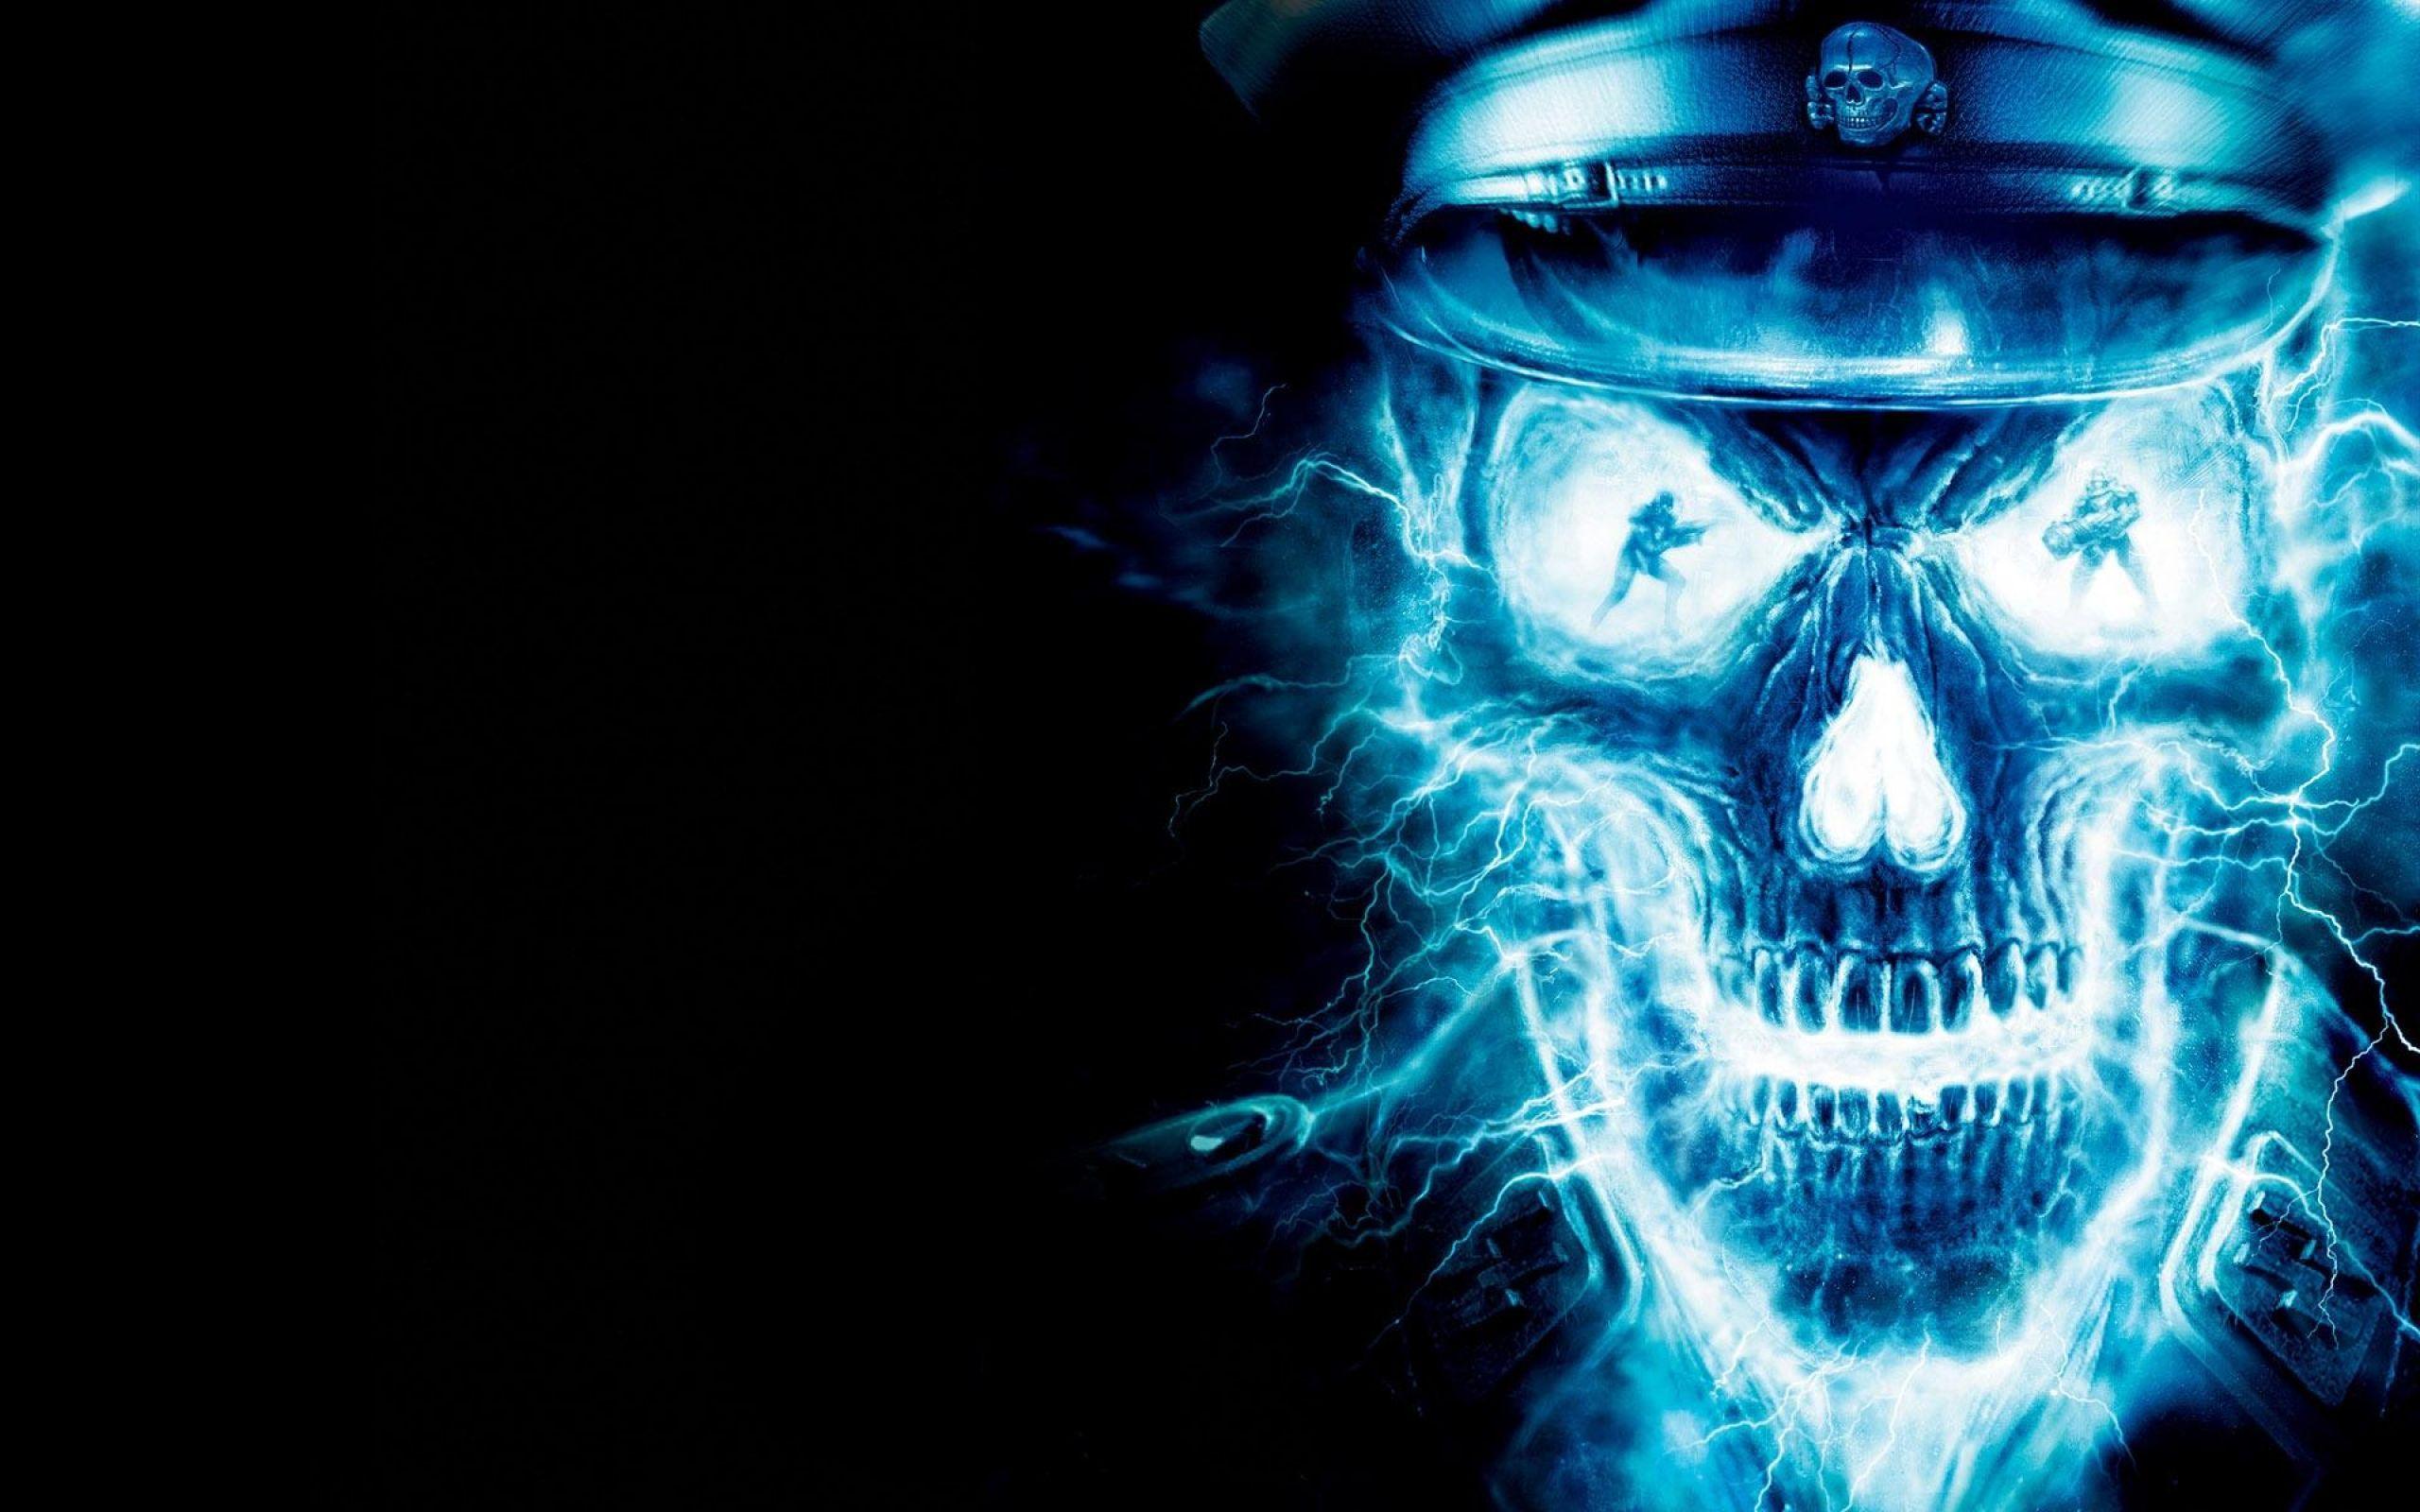 Halloween Horror Wallpaper 3D U2013 Free Download